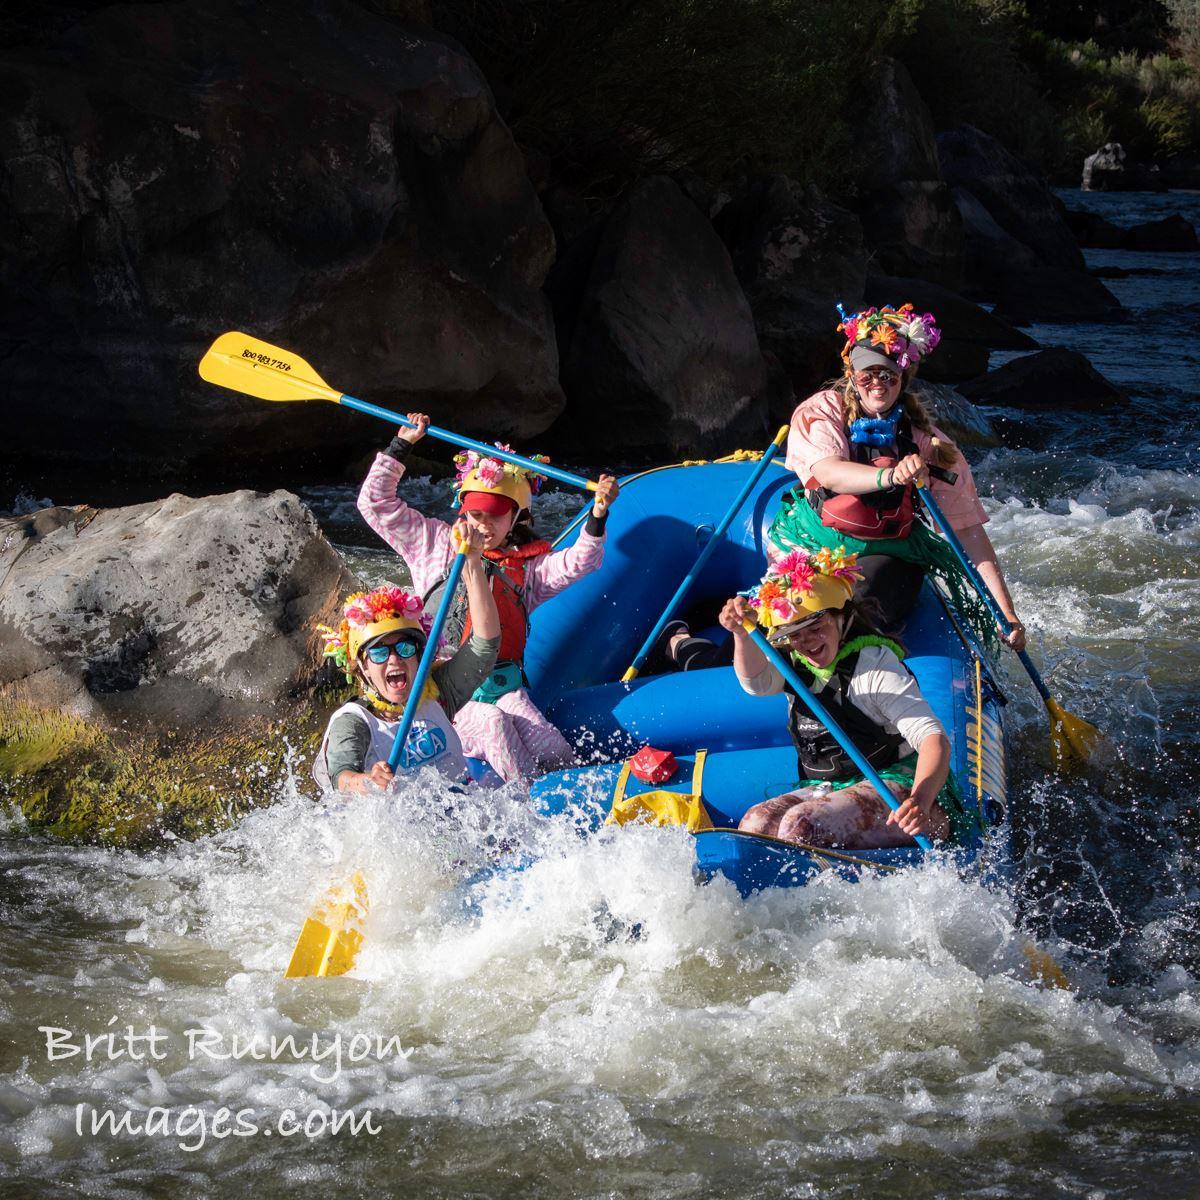 Sunday May 12 - 9:00am | Community Racecourse/Taos Box/Other Runs Paddle (Self-Organized)Informal Raft Clinic, 9:00am Taos Junction Bridge Put-In